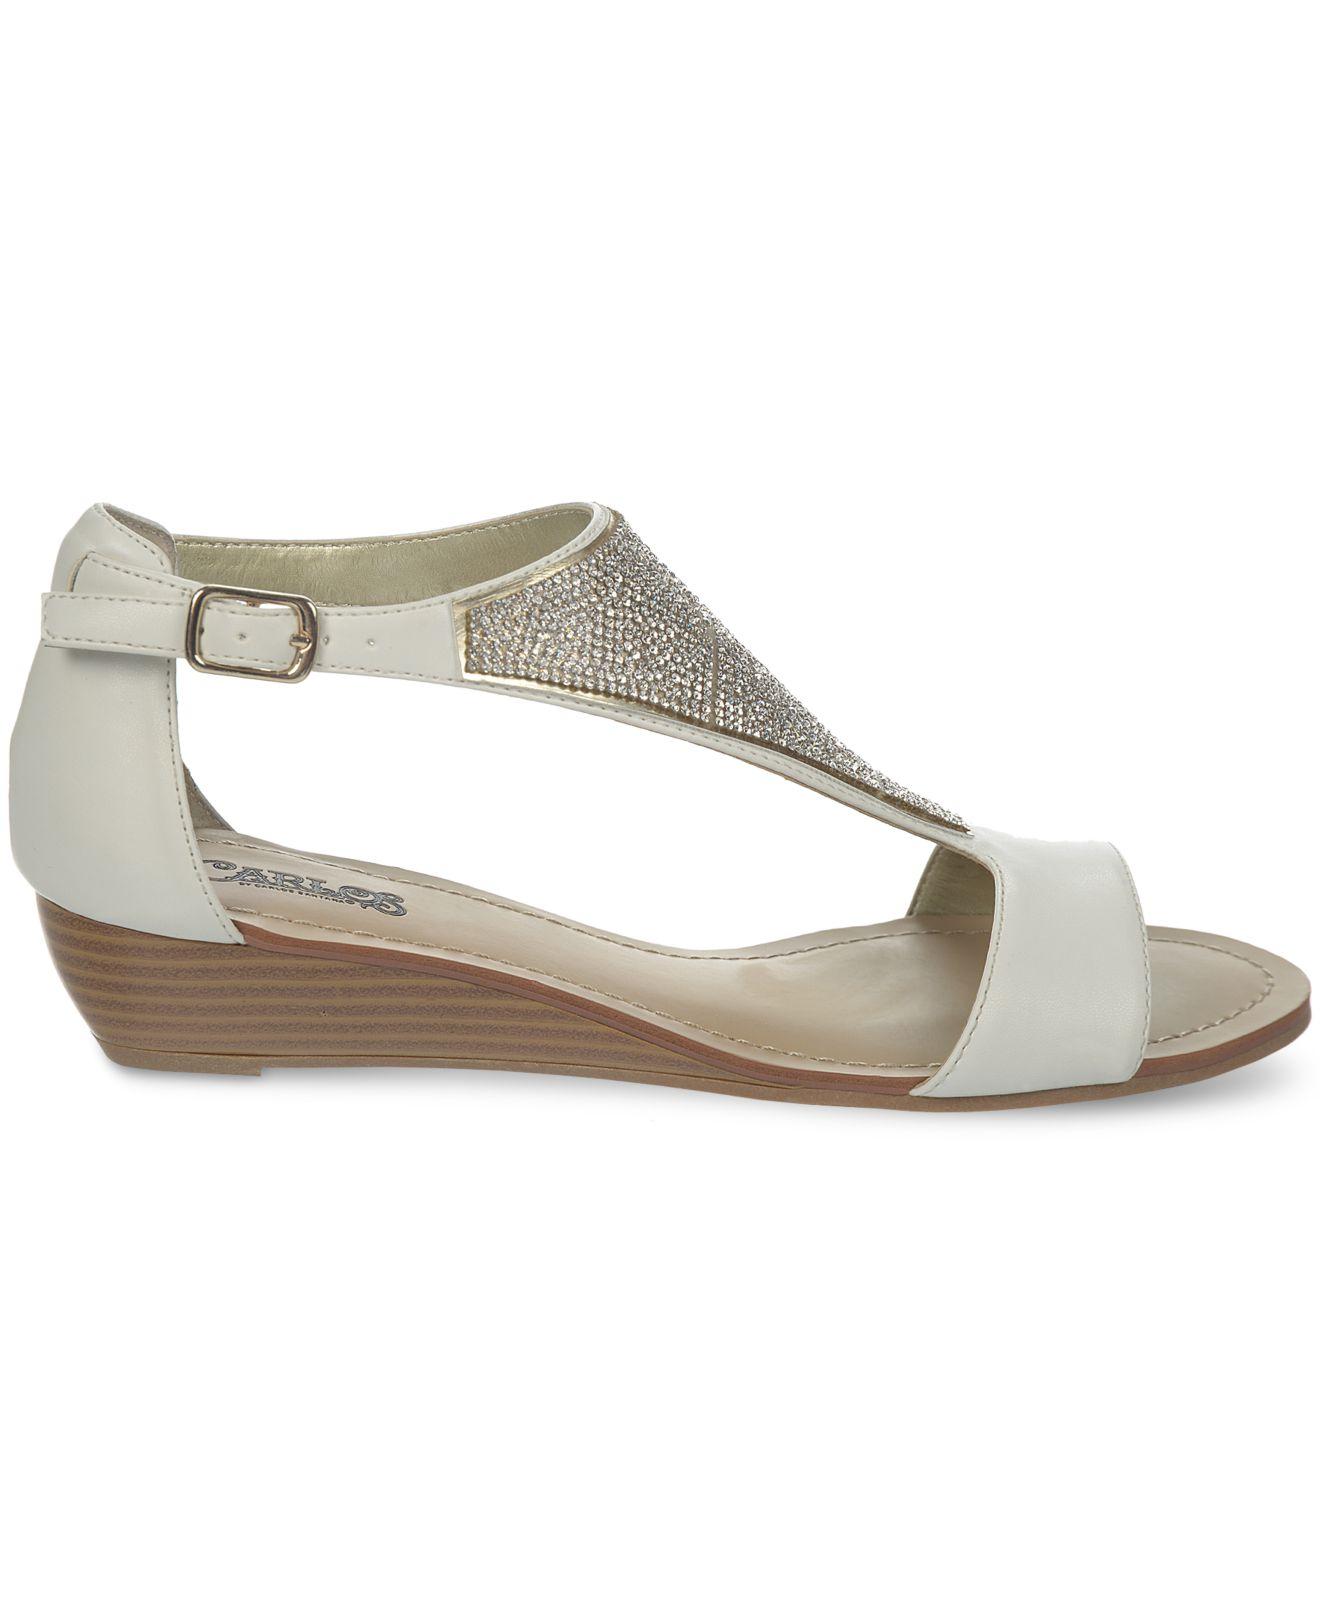 carlos by carlos santana glisten pave wedge sandals in